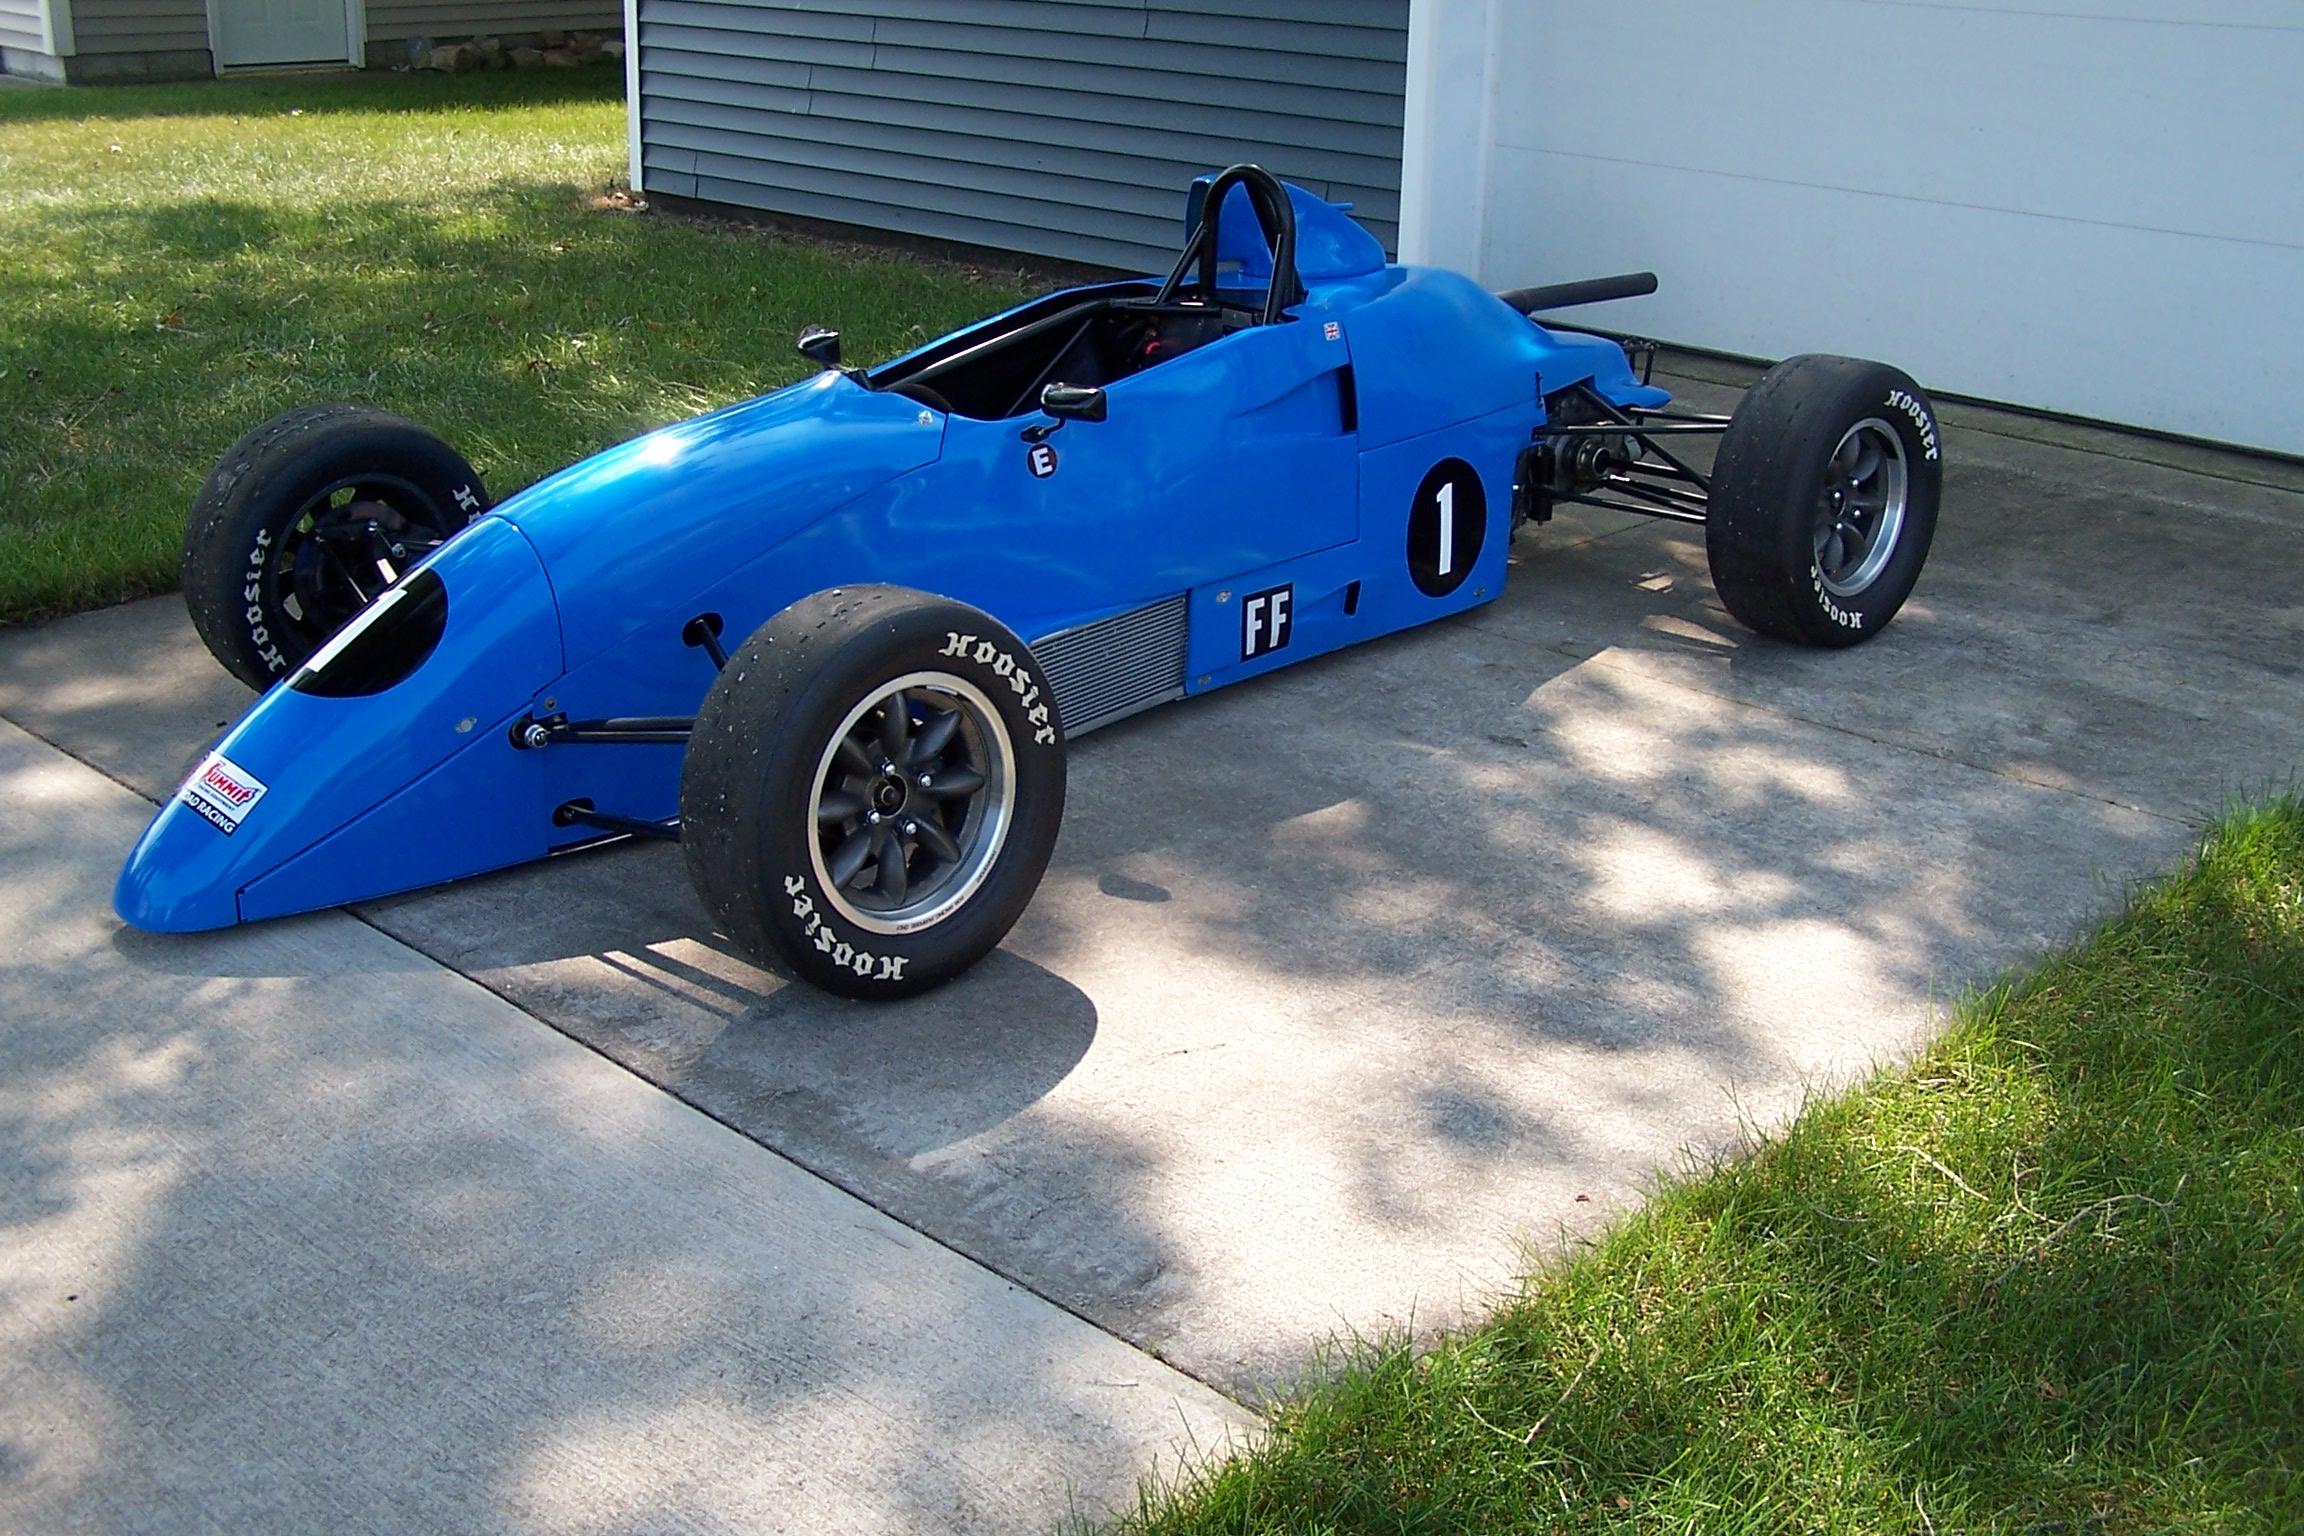 Arkansas Bill Of Sale >> Van Diemen Formula Ford Race Car For Sale - $13320